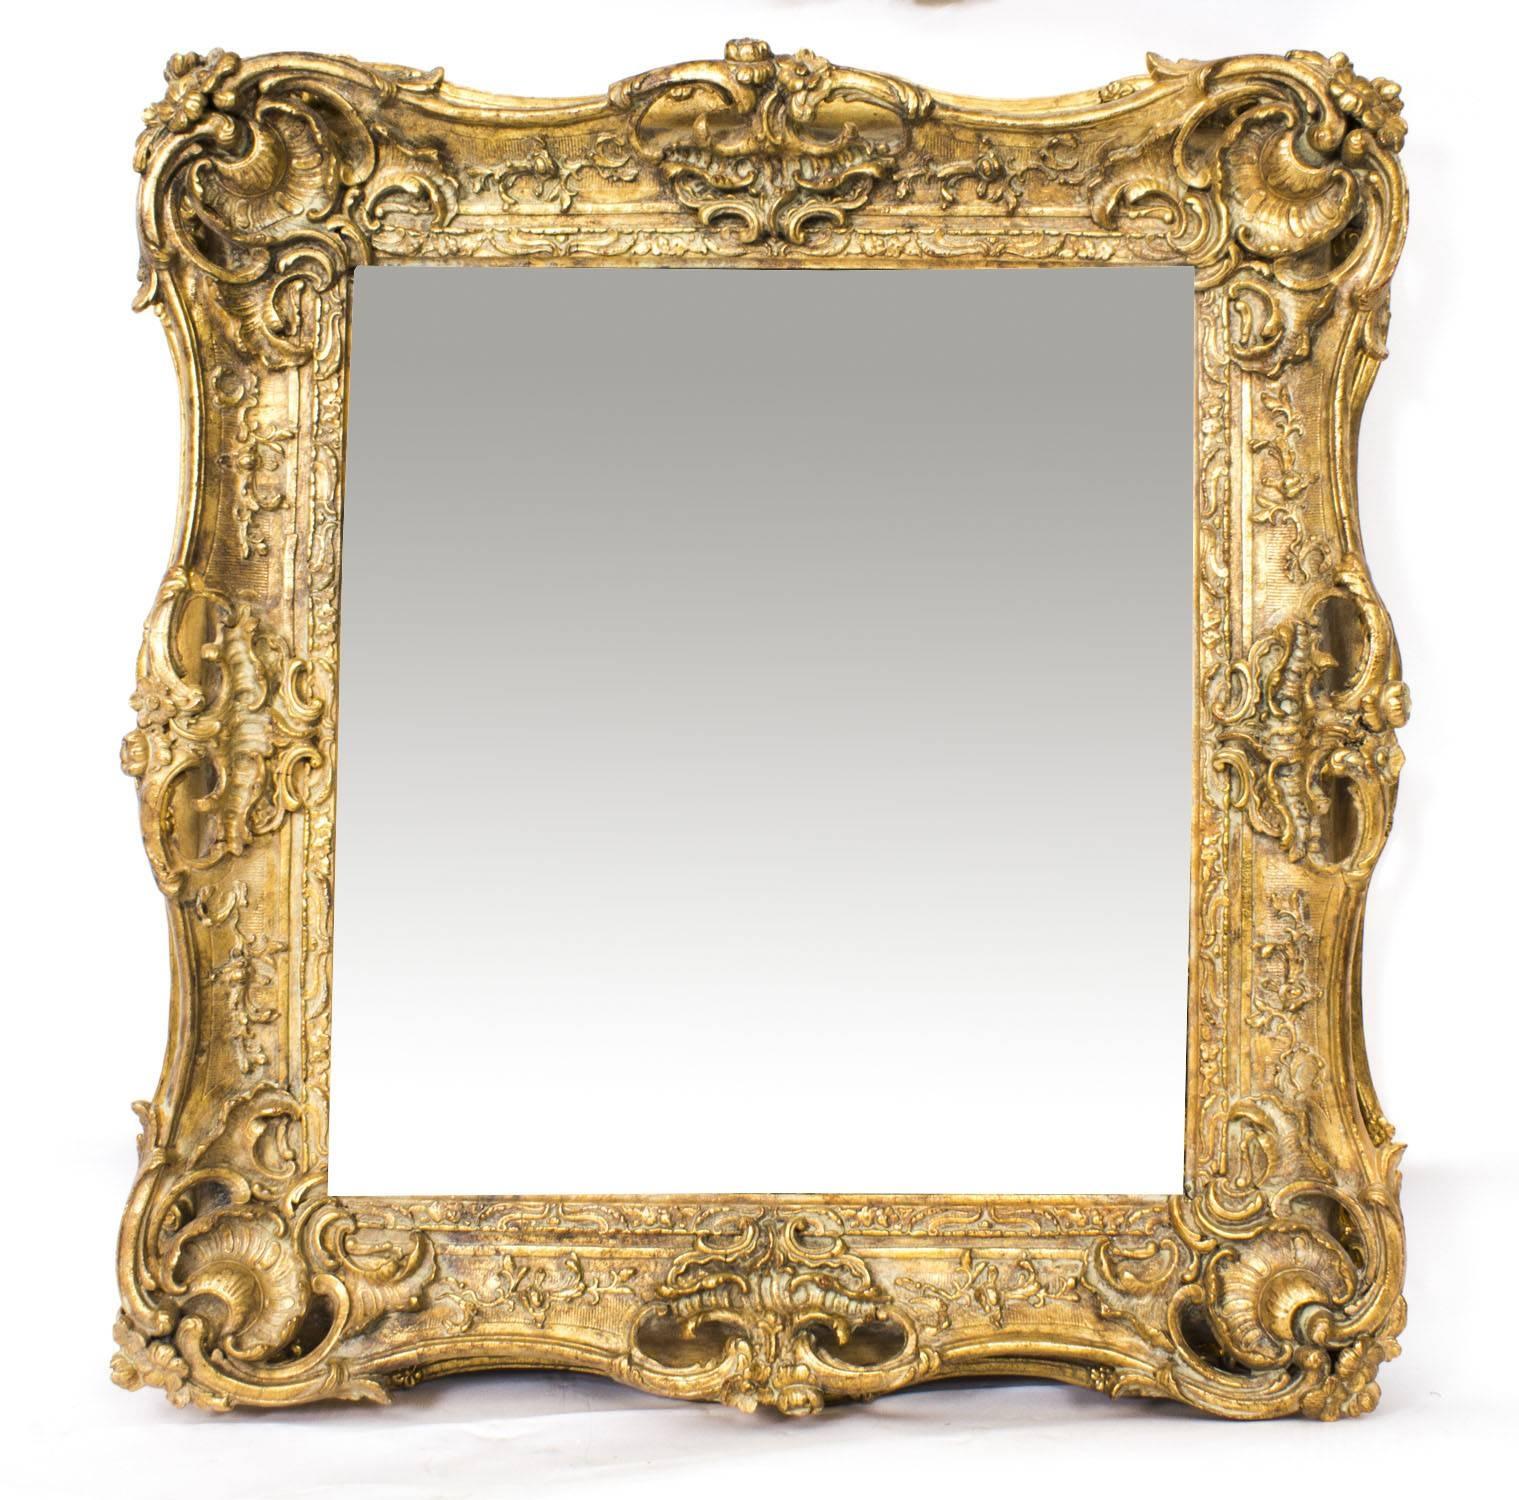 Antique Victorian Giltwood Mirror C.1870 100X90Cm | Vinterior throughout Antique Victorian Mirrors (Image 6 of 15)